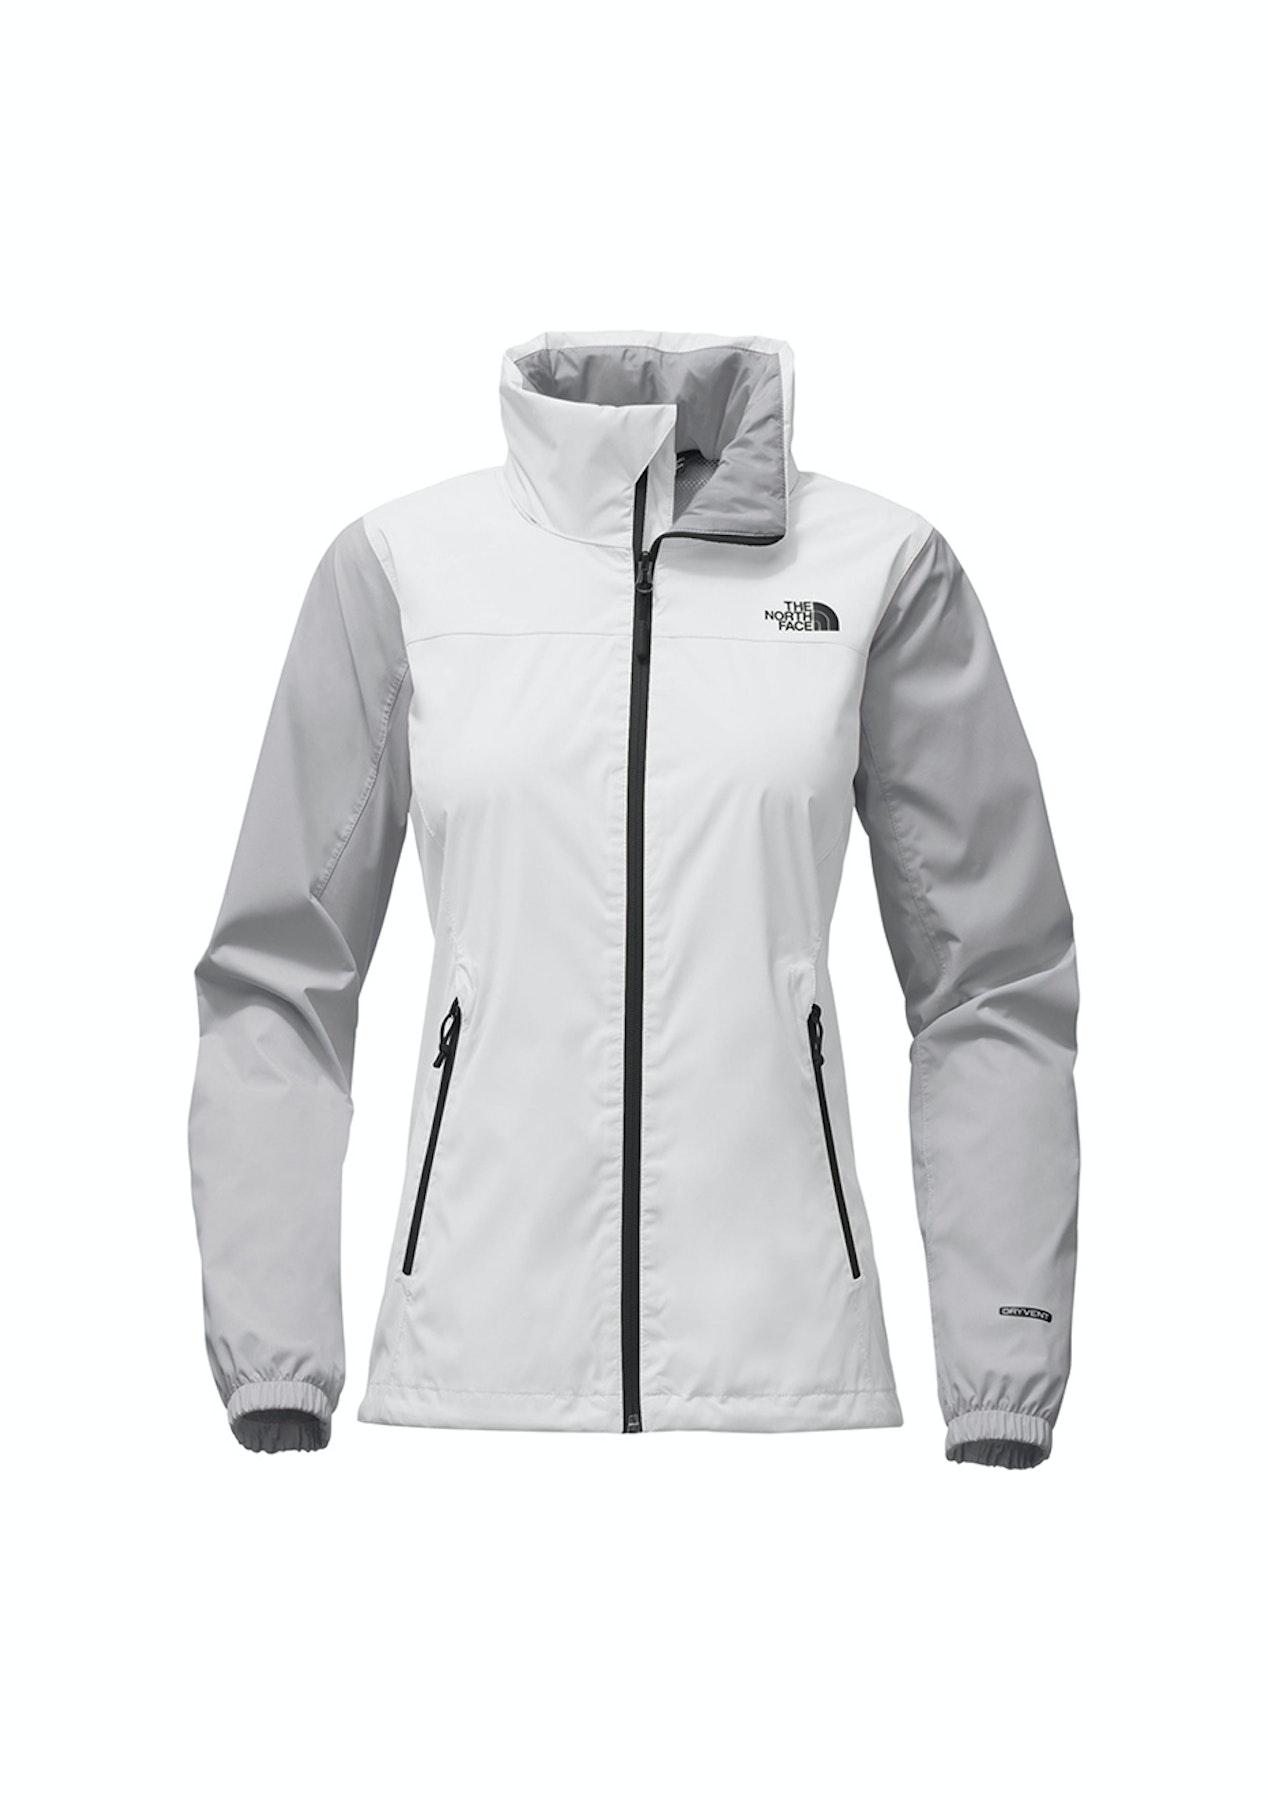 b04e57c2f The North Face - Resolve Plus Jacket Hite - Womens